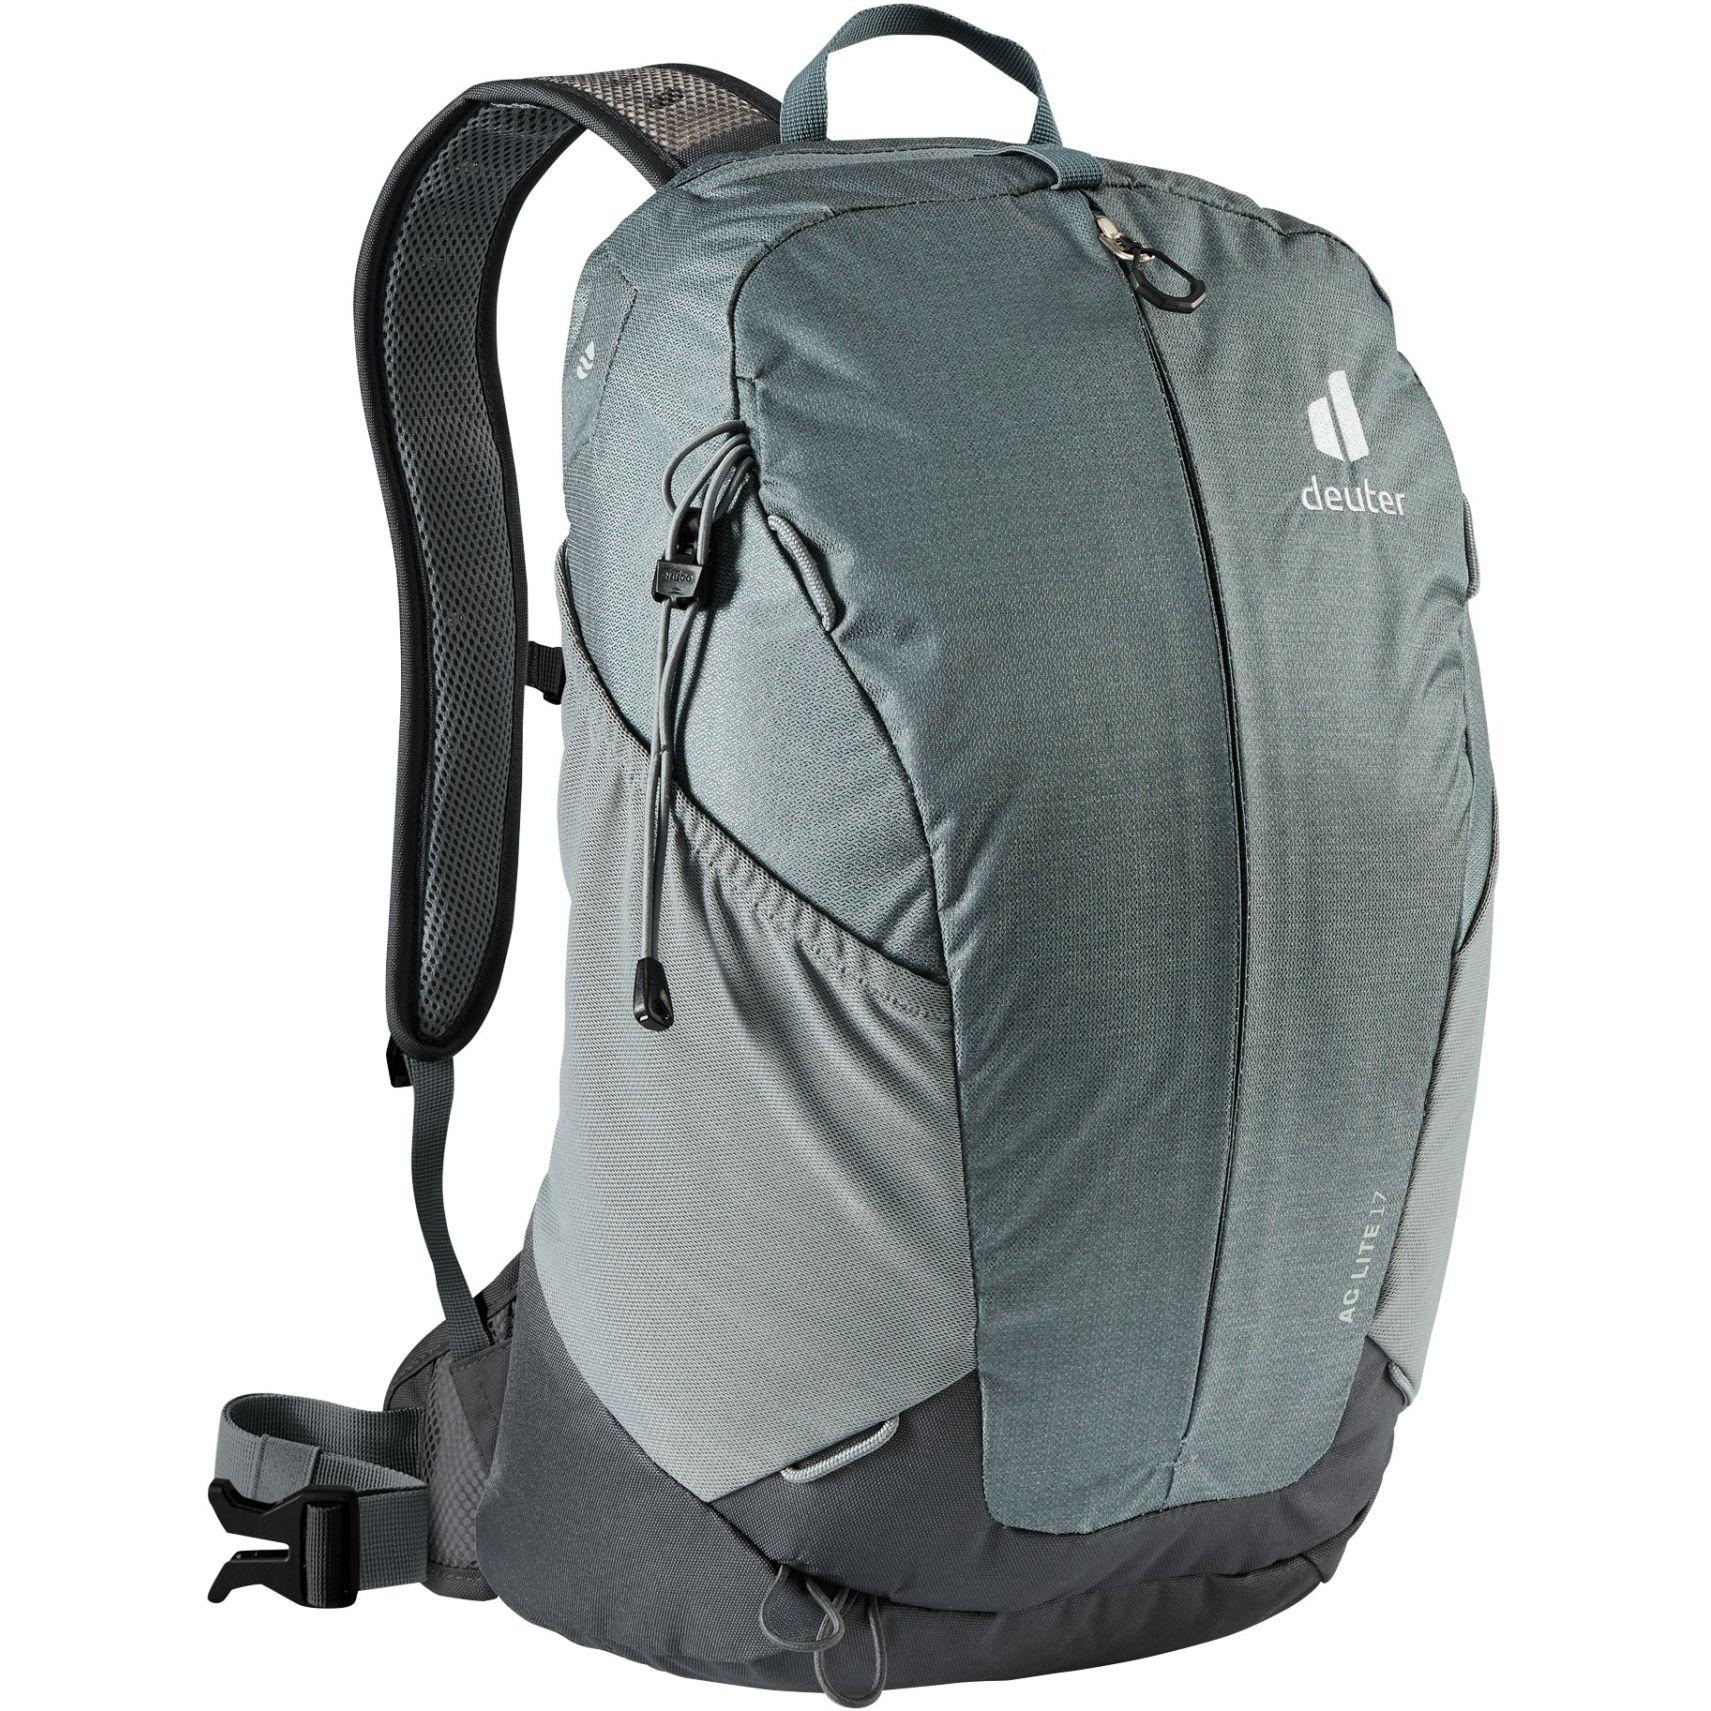 Deuter AC Lite 17 Backpack - shale-graphite